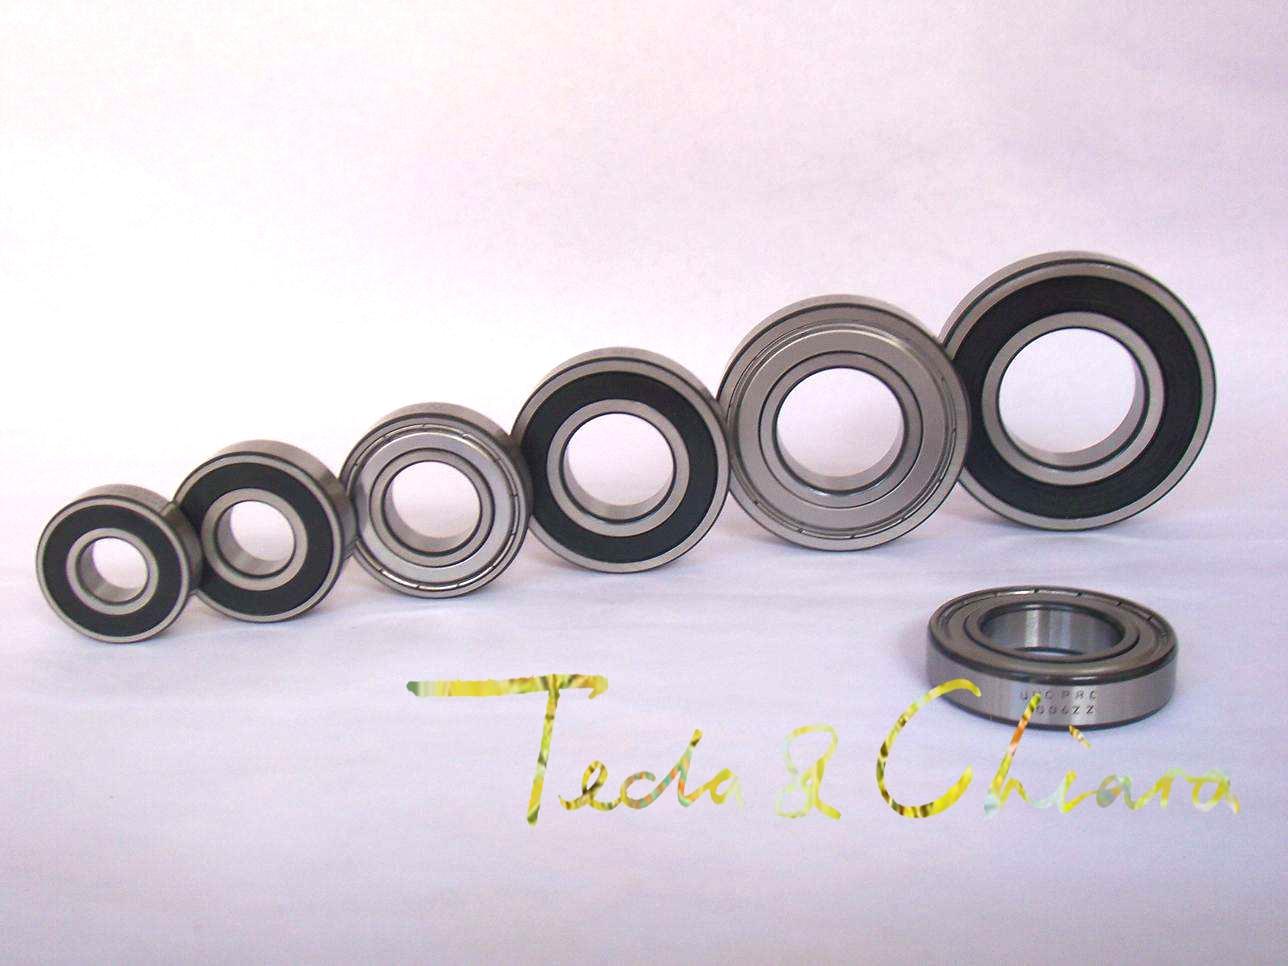 626-626zz-626rs-626-2z-626z-626-2rs-zz-rs-rz-2rz-deep-groove-ball-bearings-6-x-19-x-6mm